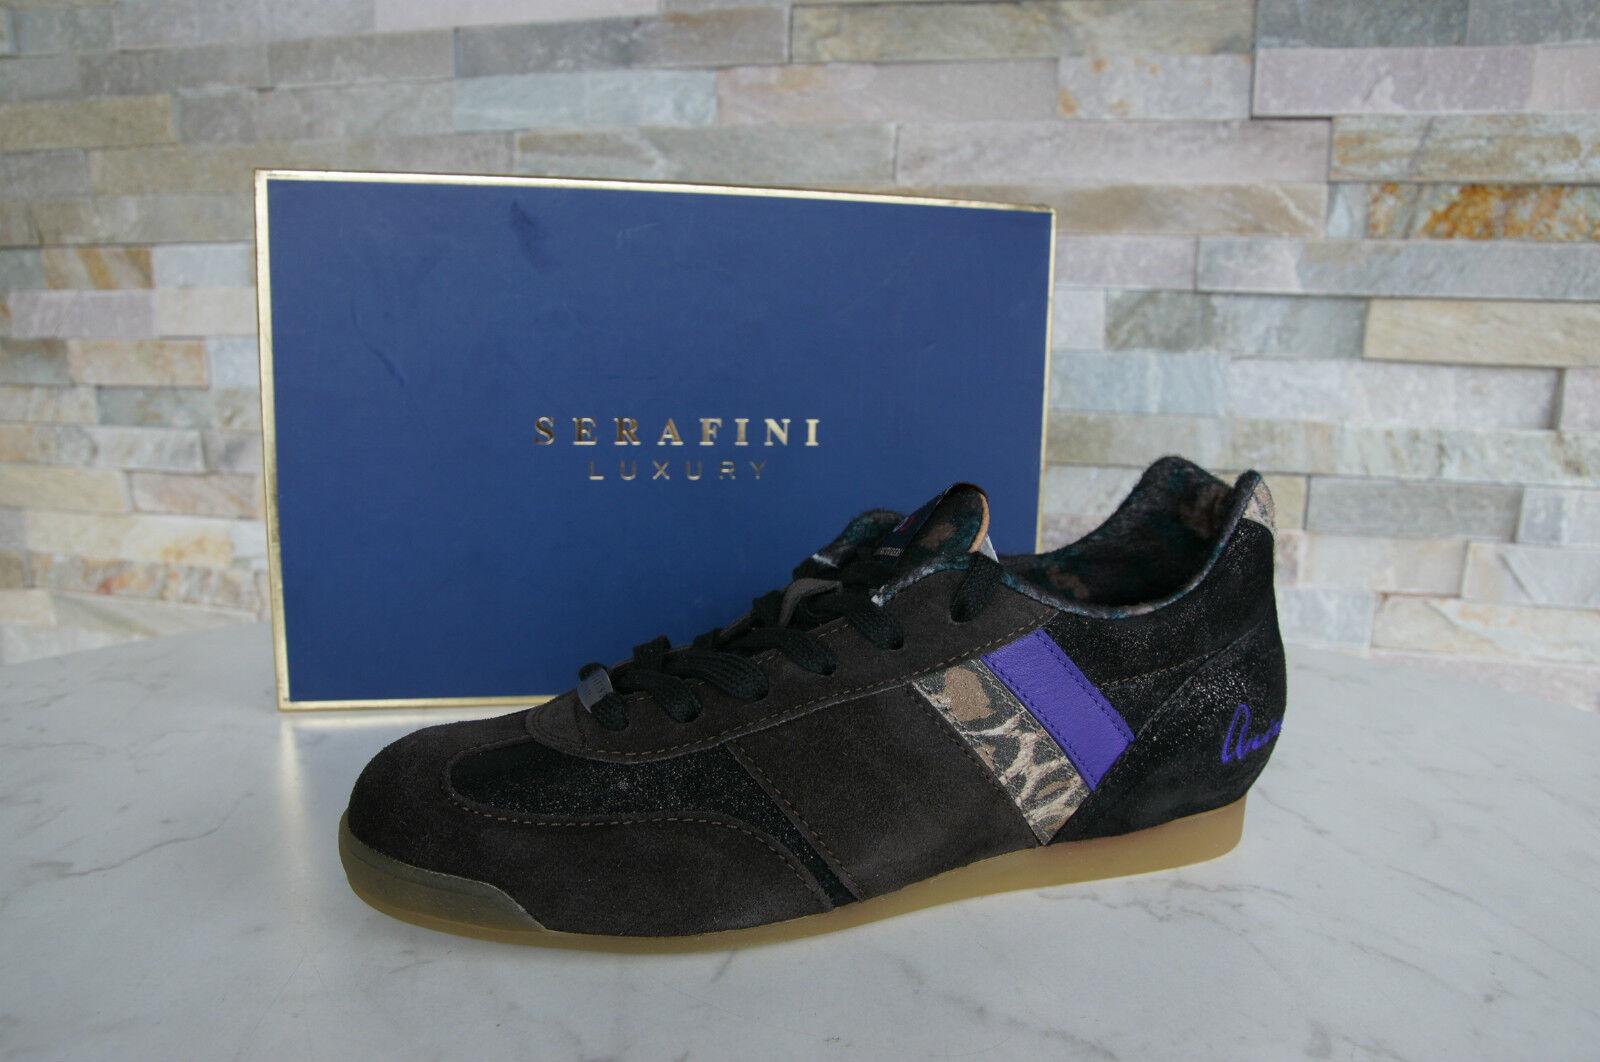 Zapatos promocionales para hombres y mujeres SERAFINI LUXURY Sneakers Gr 41 Schnürschuhe Schuhe Scarpe Animal neu UVP 195